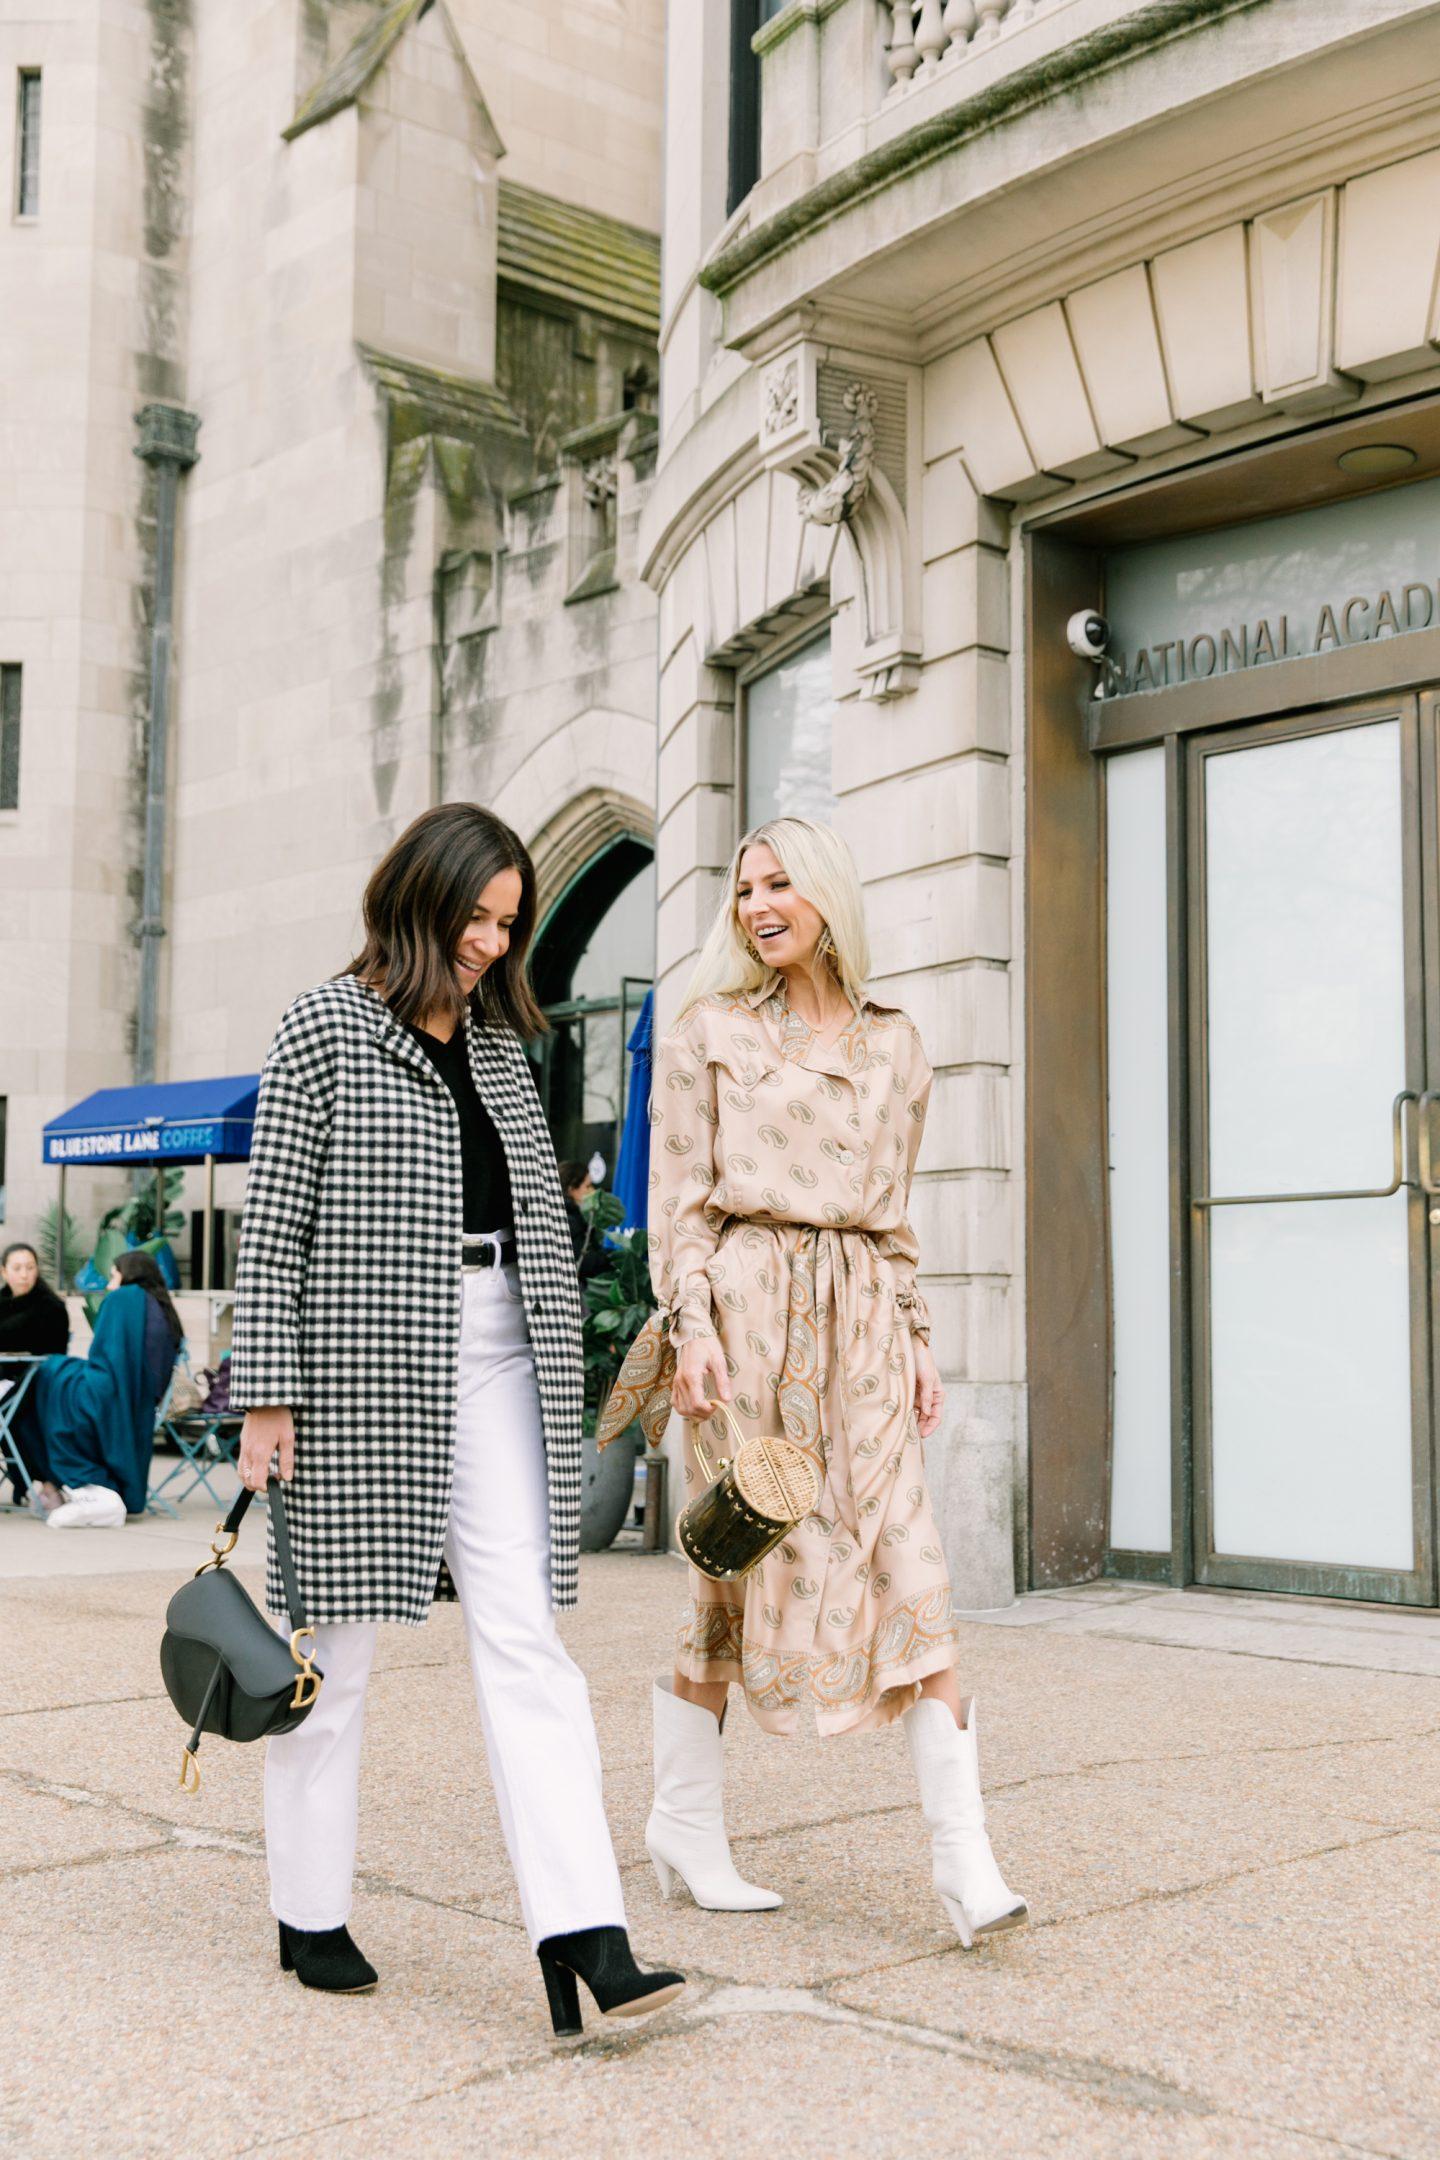 Faithfully Fashionable:My Q & A with Adi Heyman